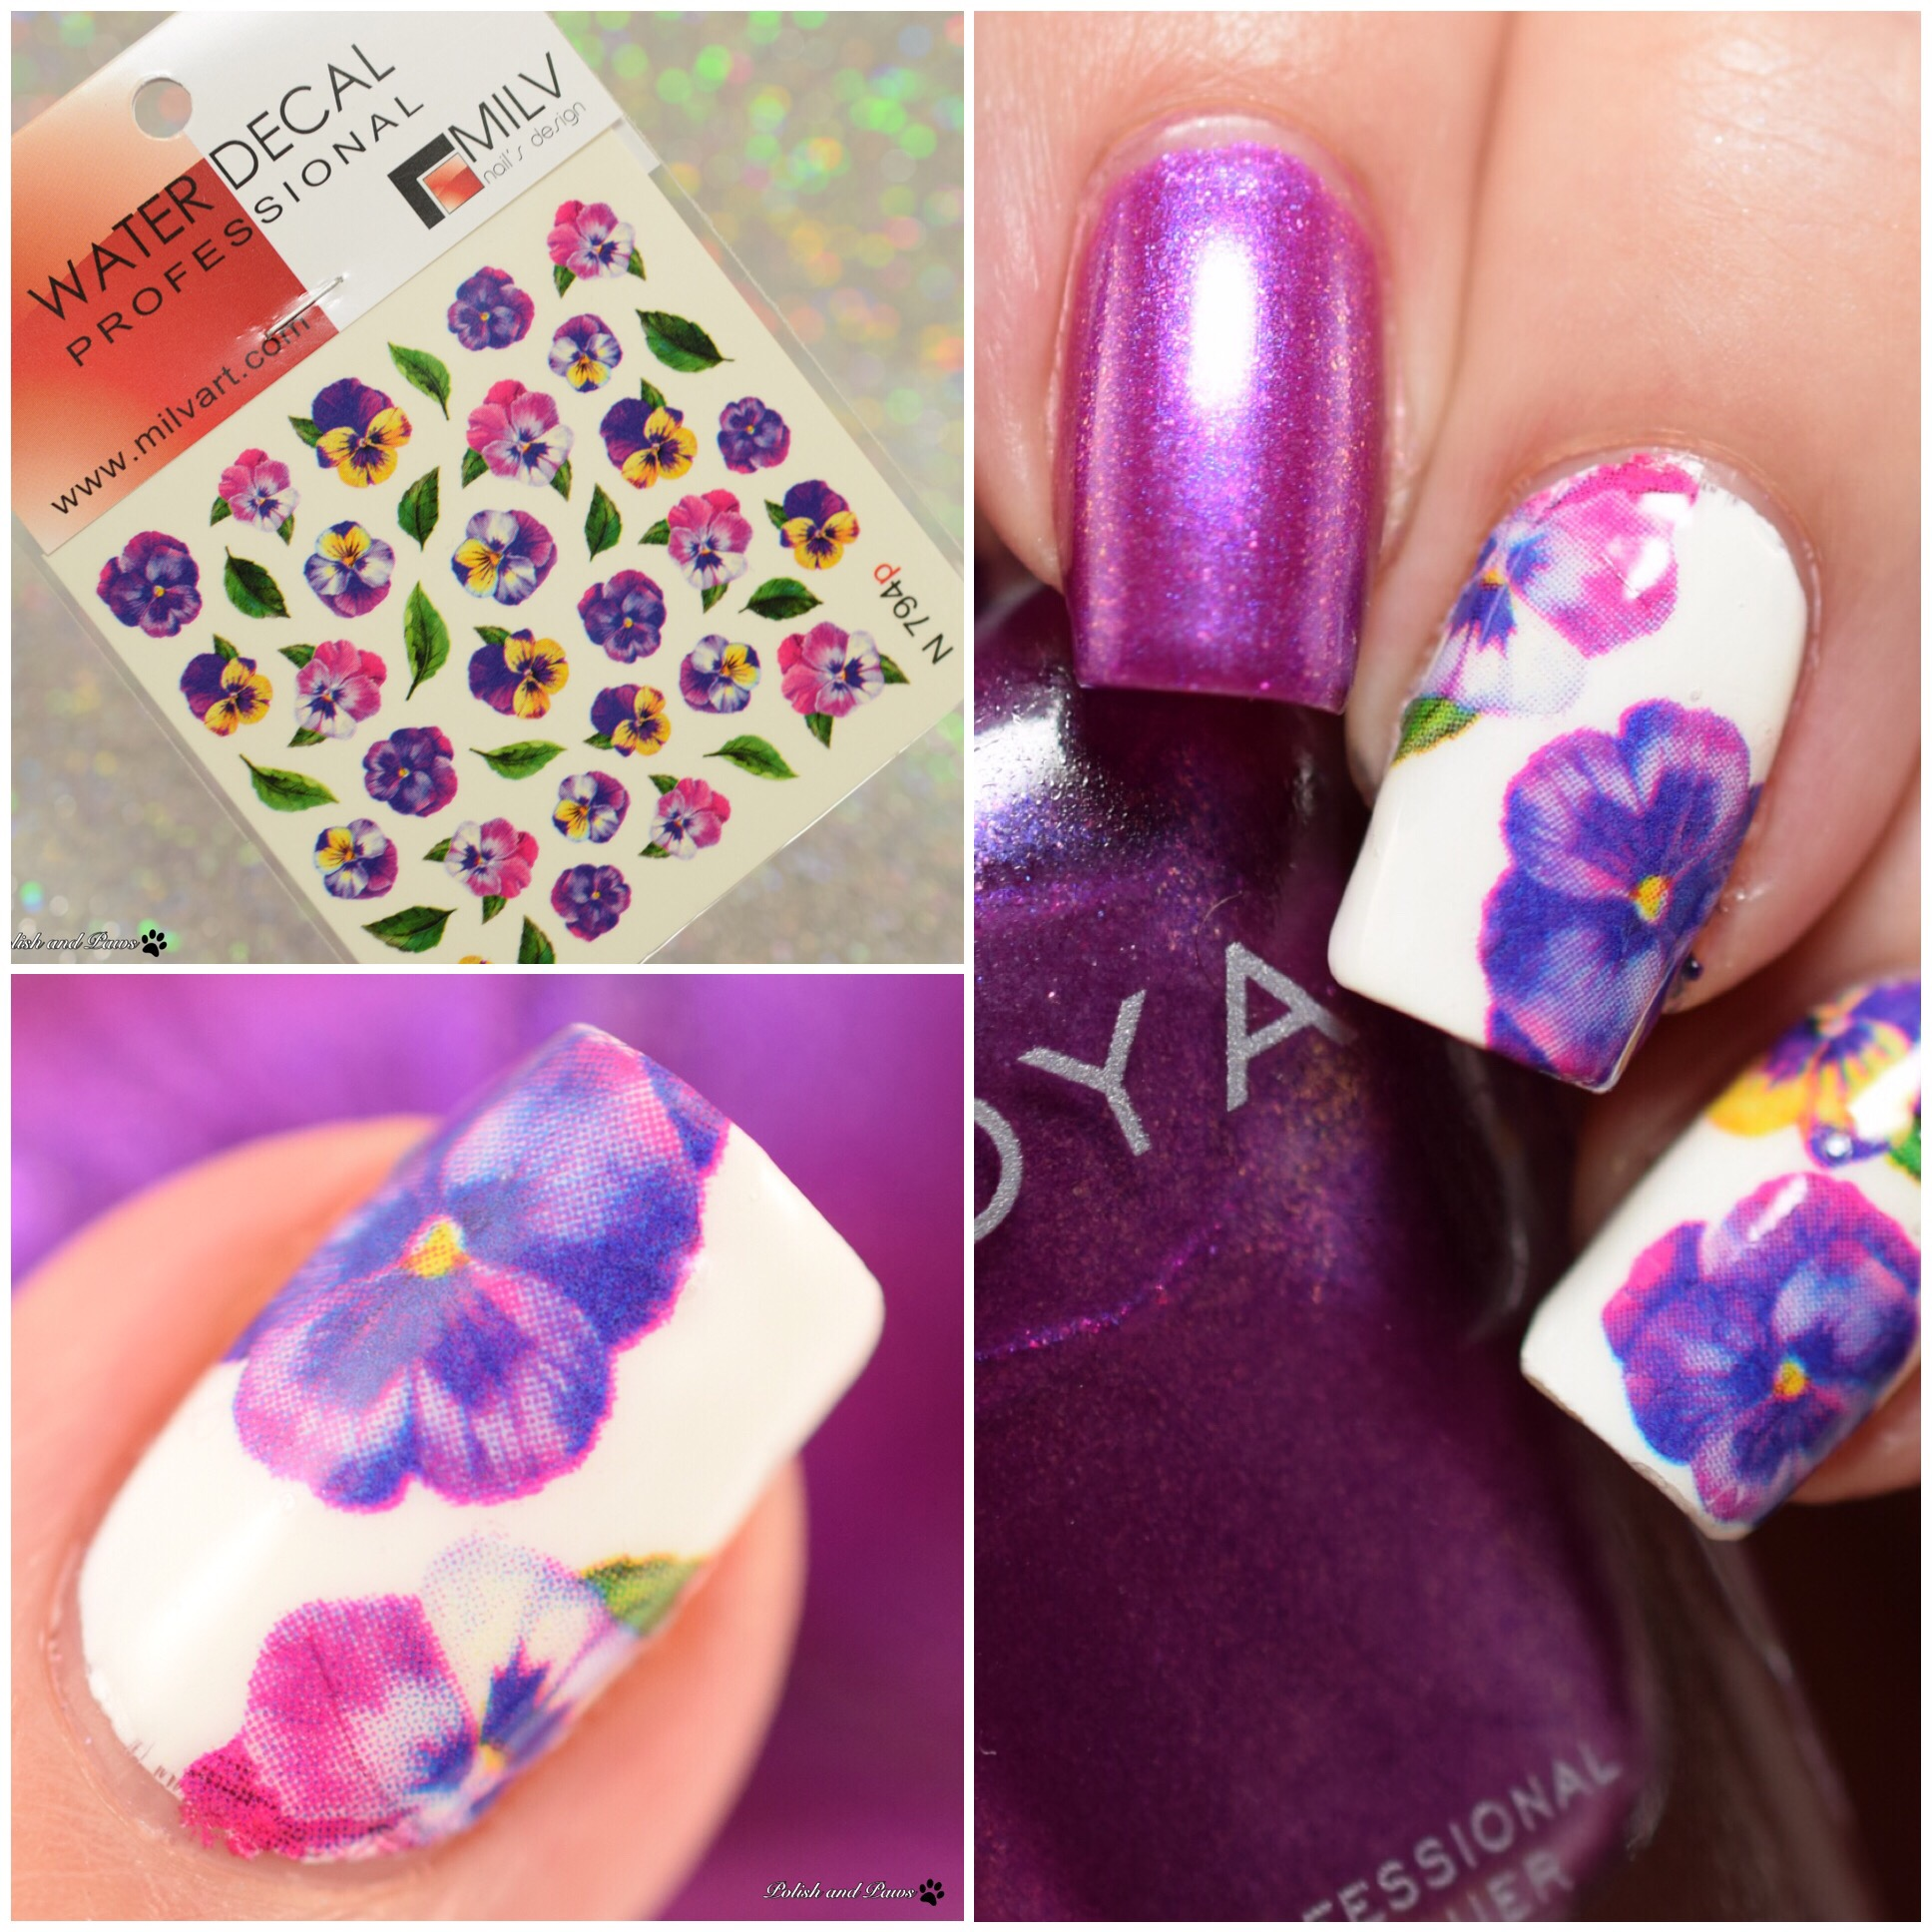 MILV Nail Art Violet Floral Decals N794